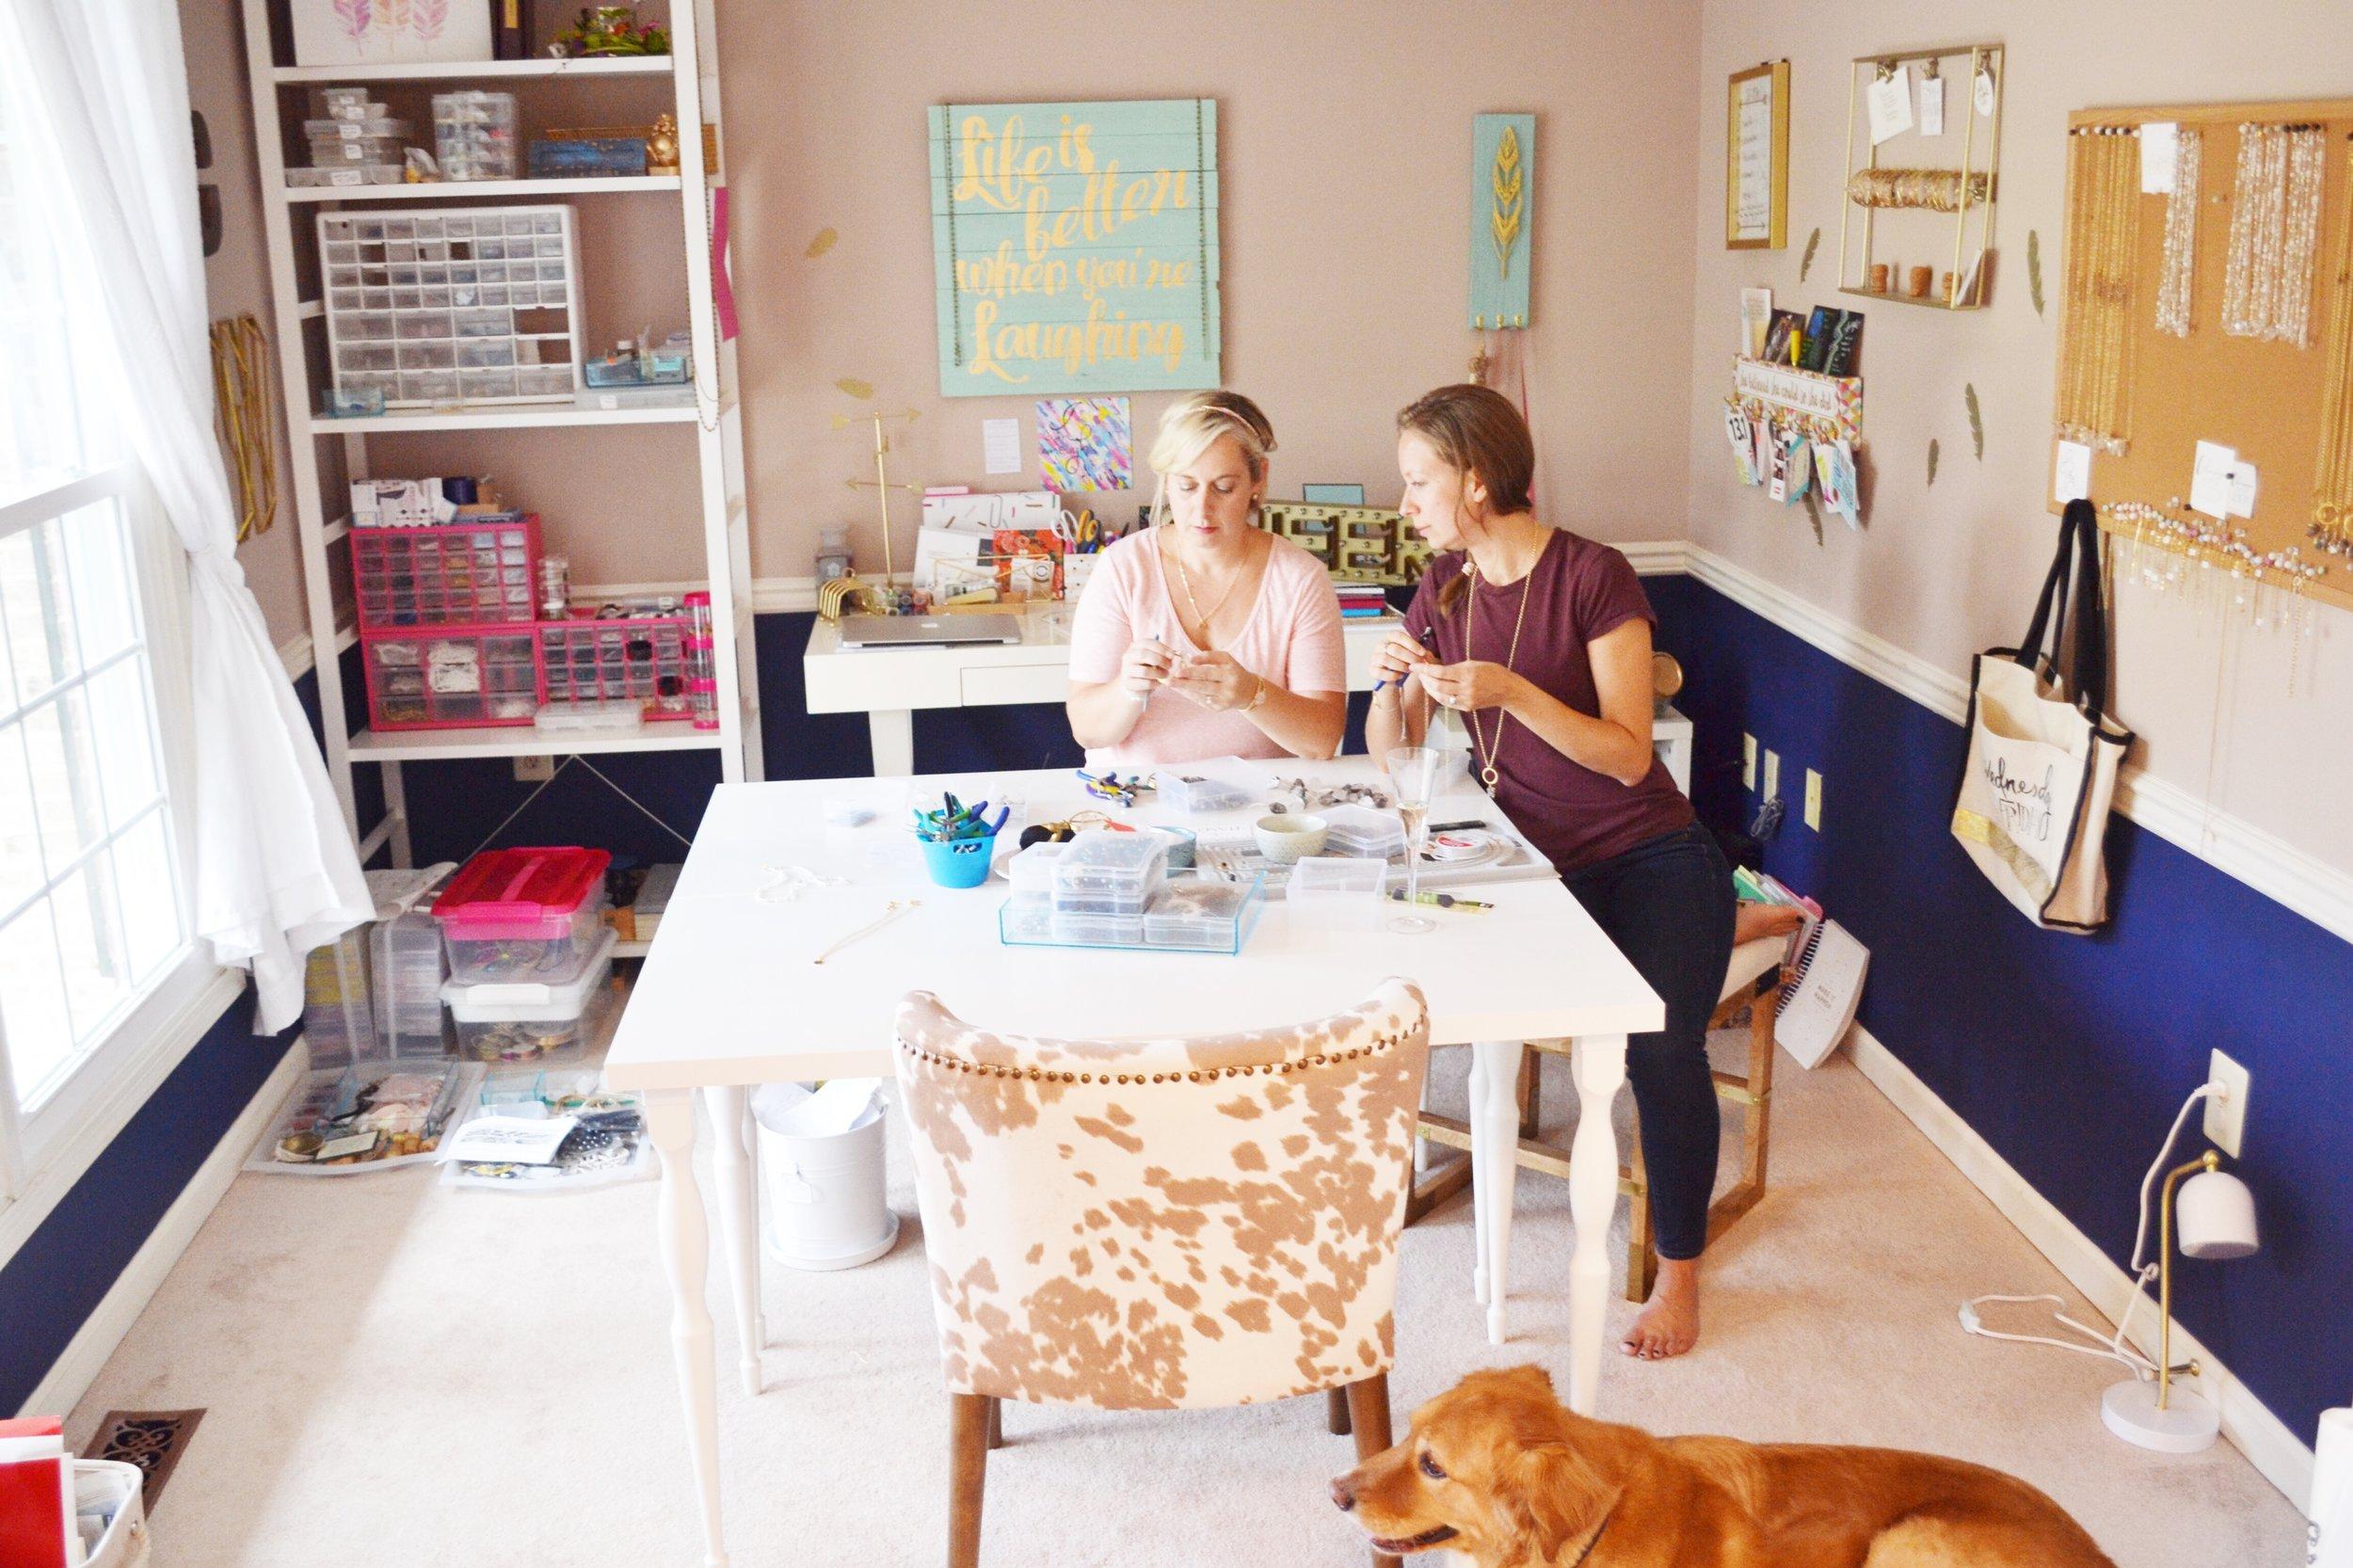 handmade jewelry workspace